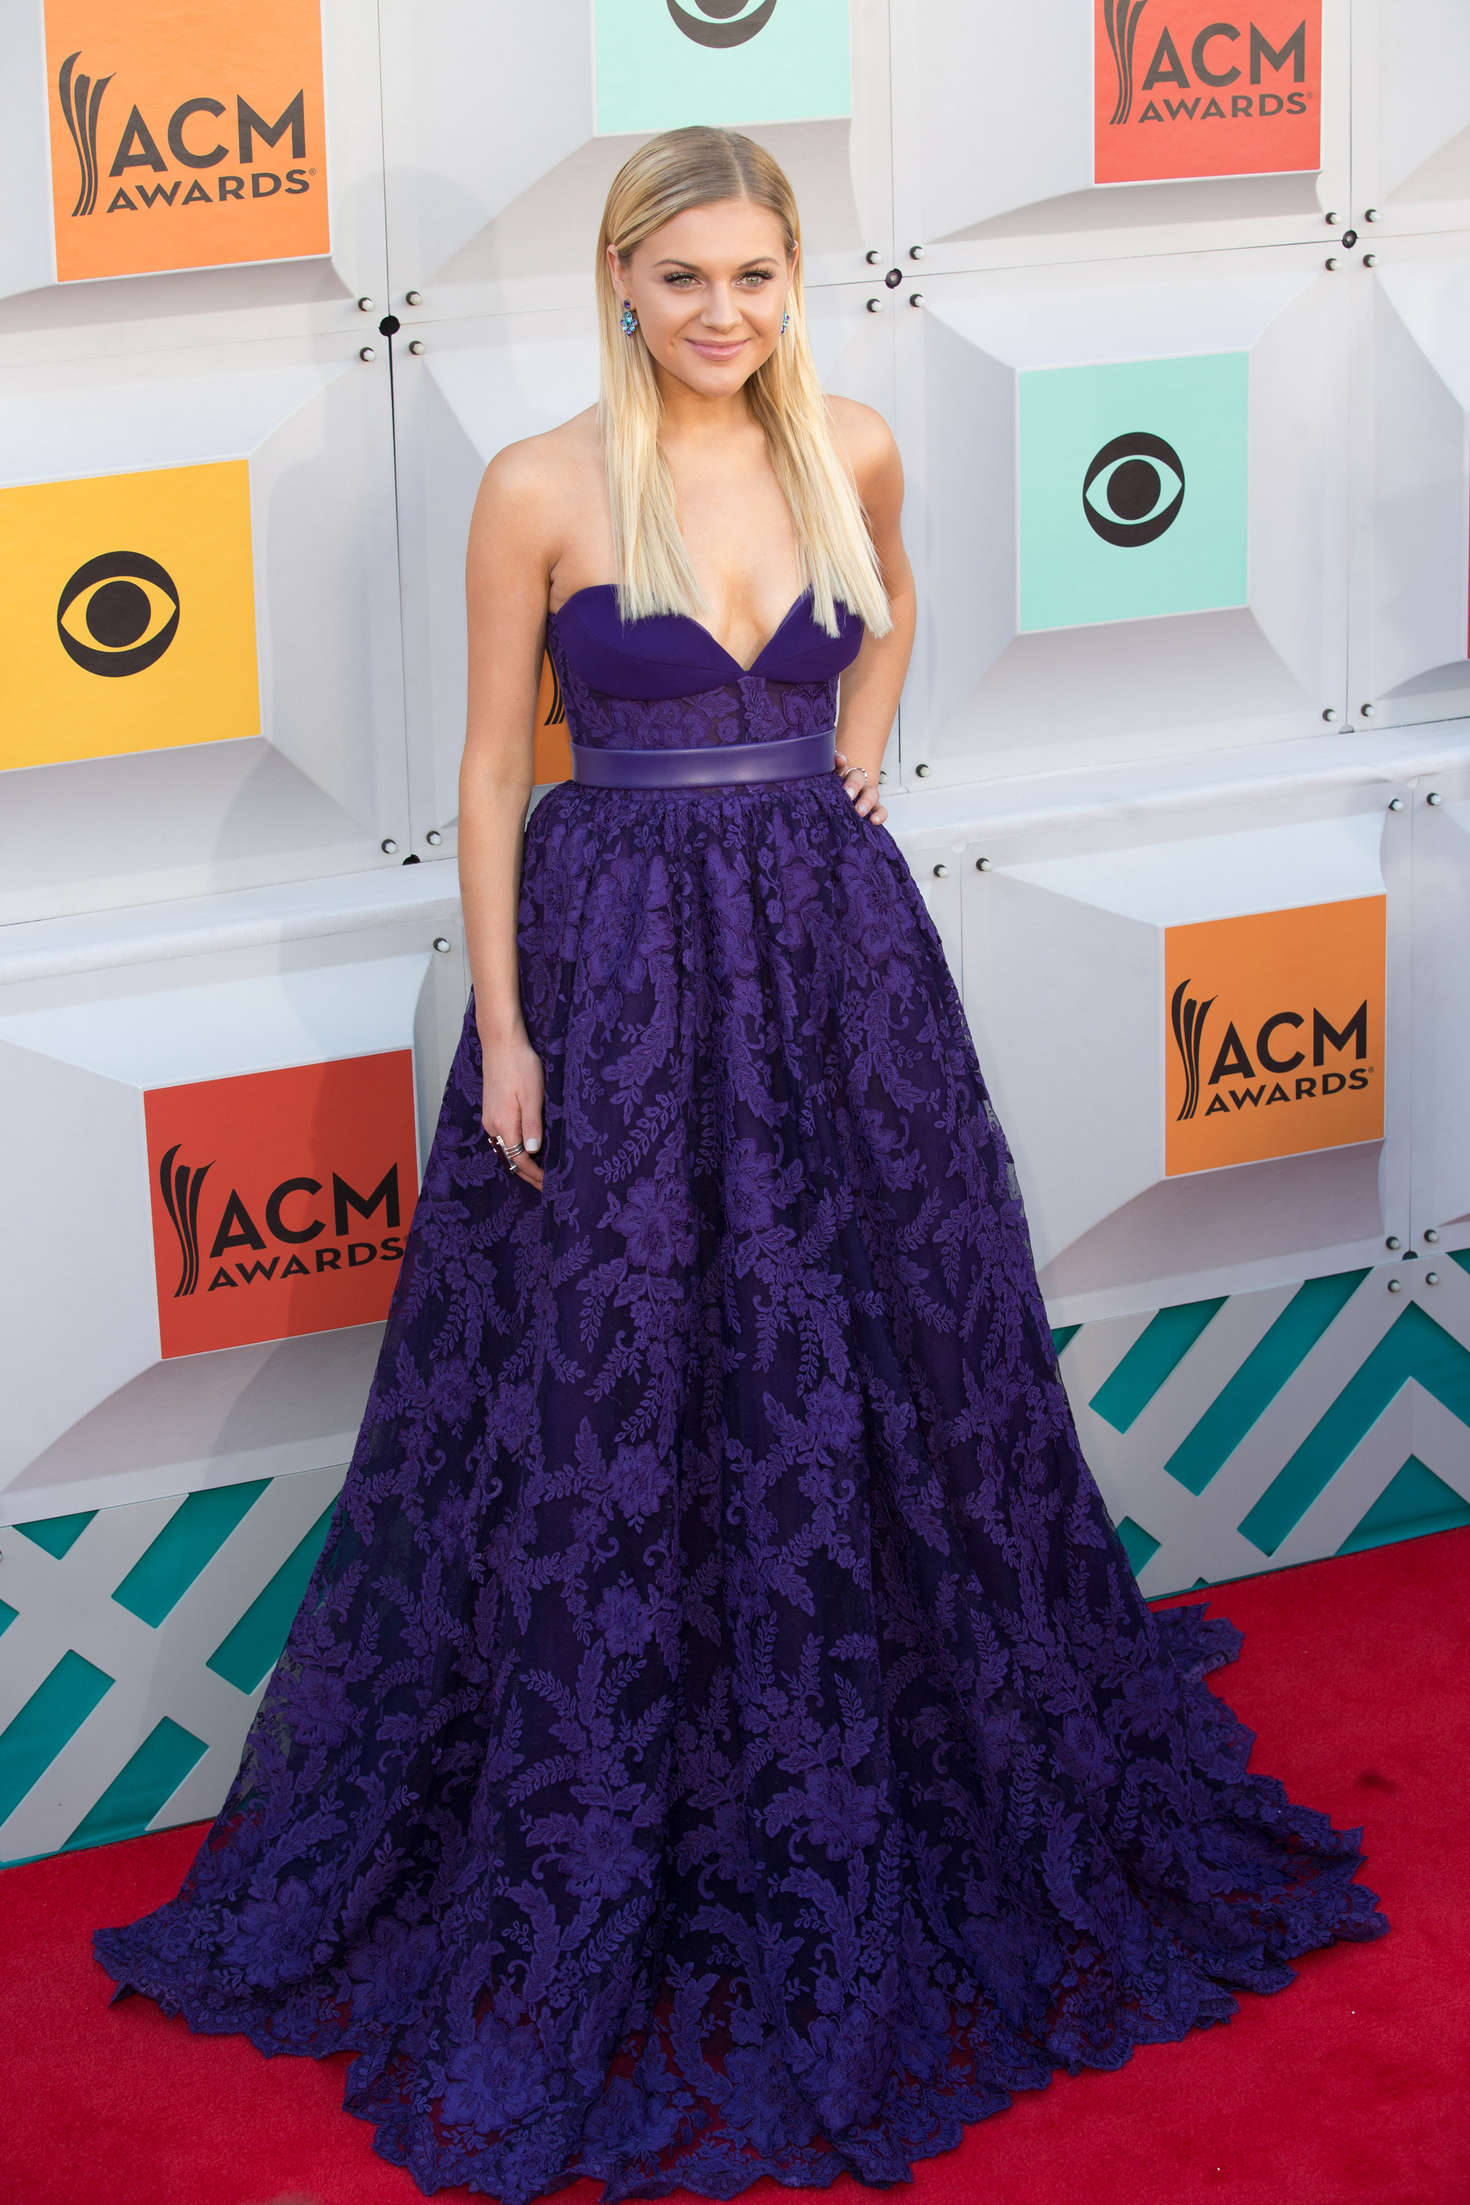 Kelsea Ballerini 2016 : Kelsea Ballerini: 2016 Academy of Country Music Awards -02